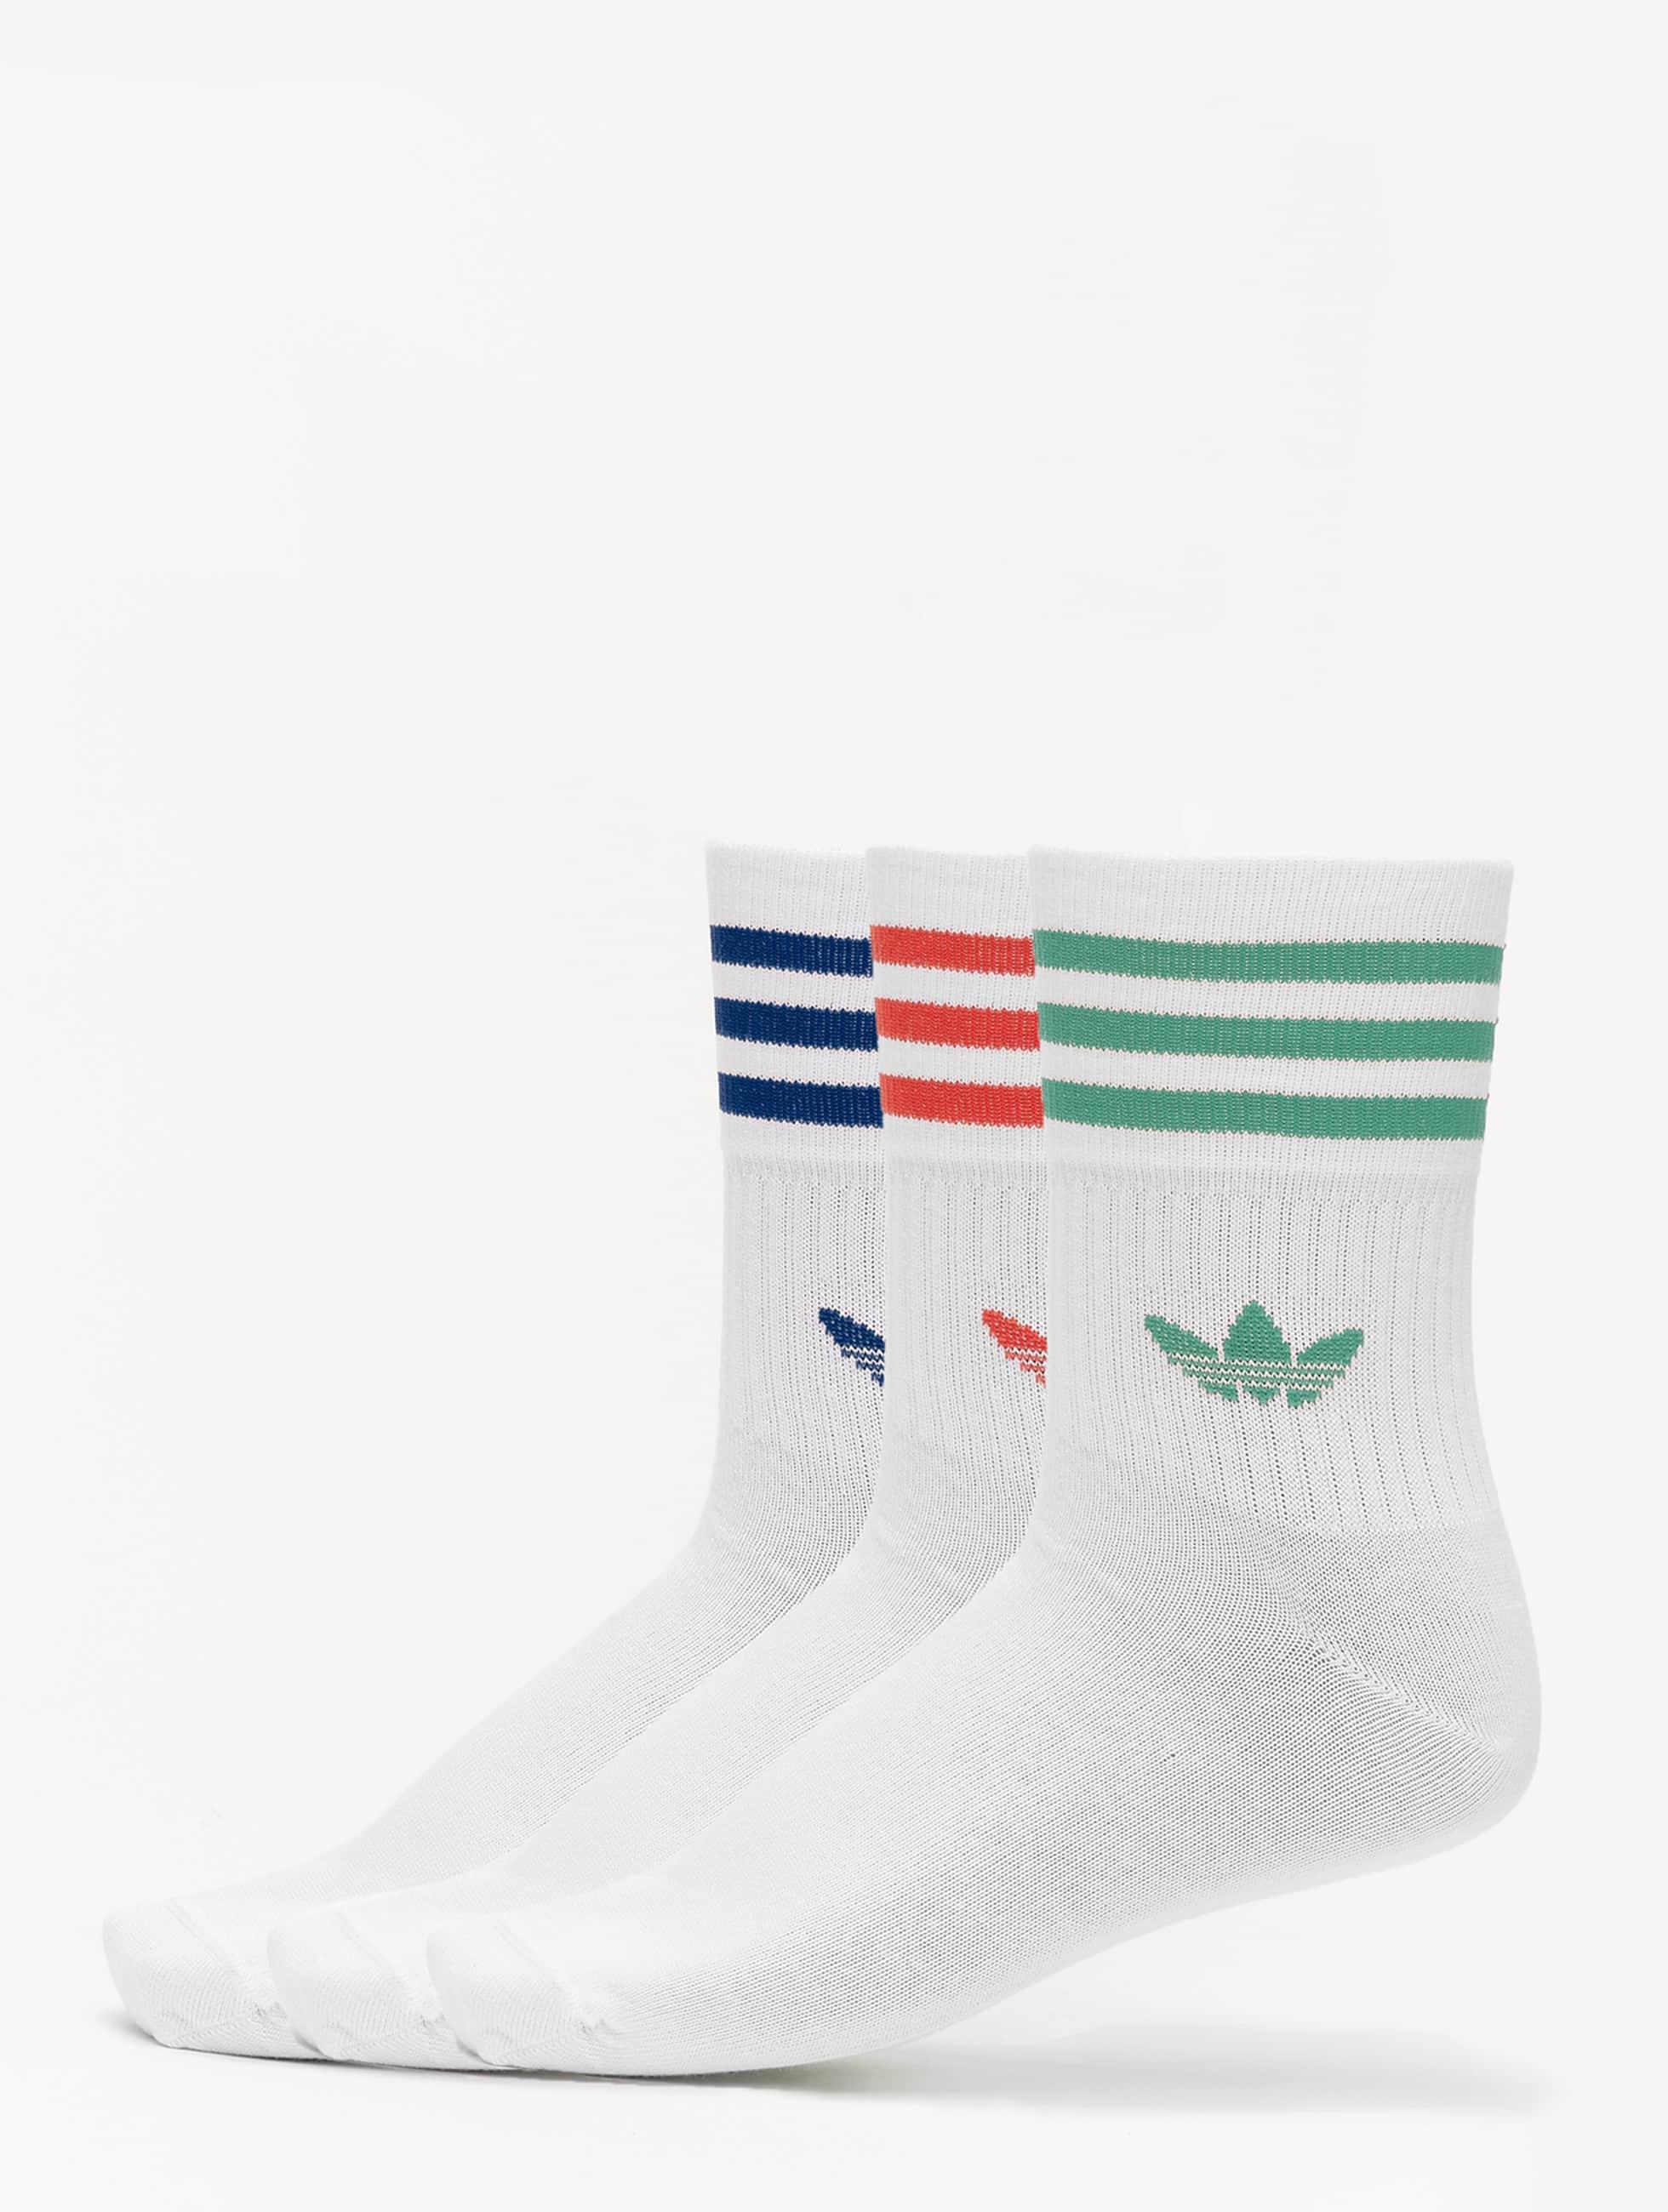 Adidas Mid Cut Crew Socks WhiteWhiteWhite